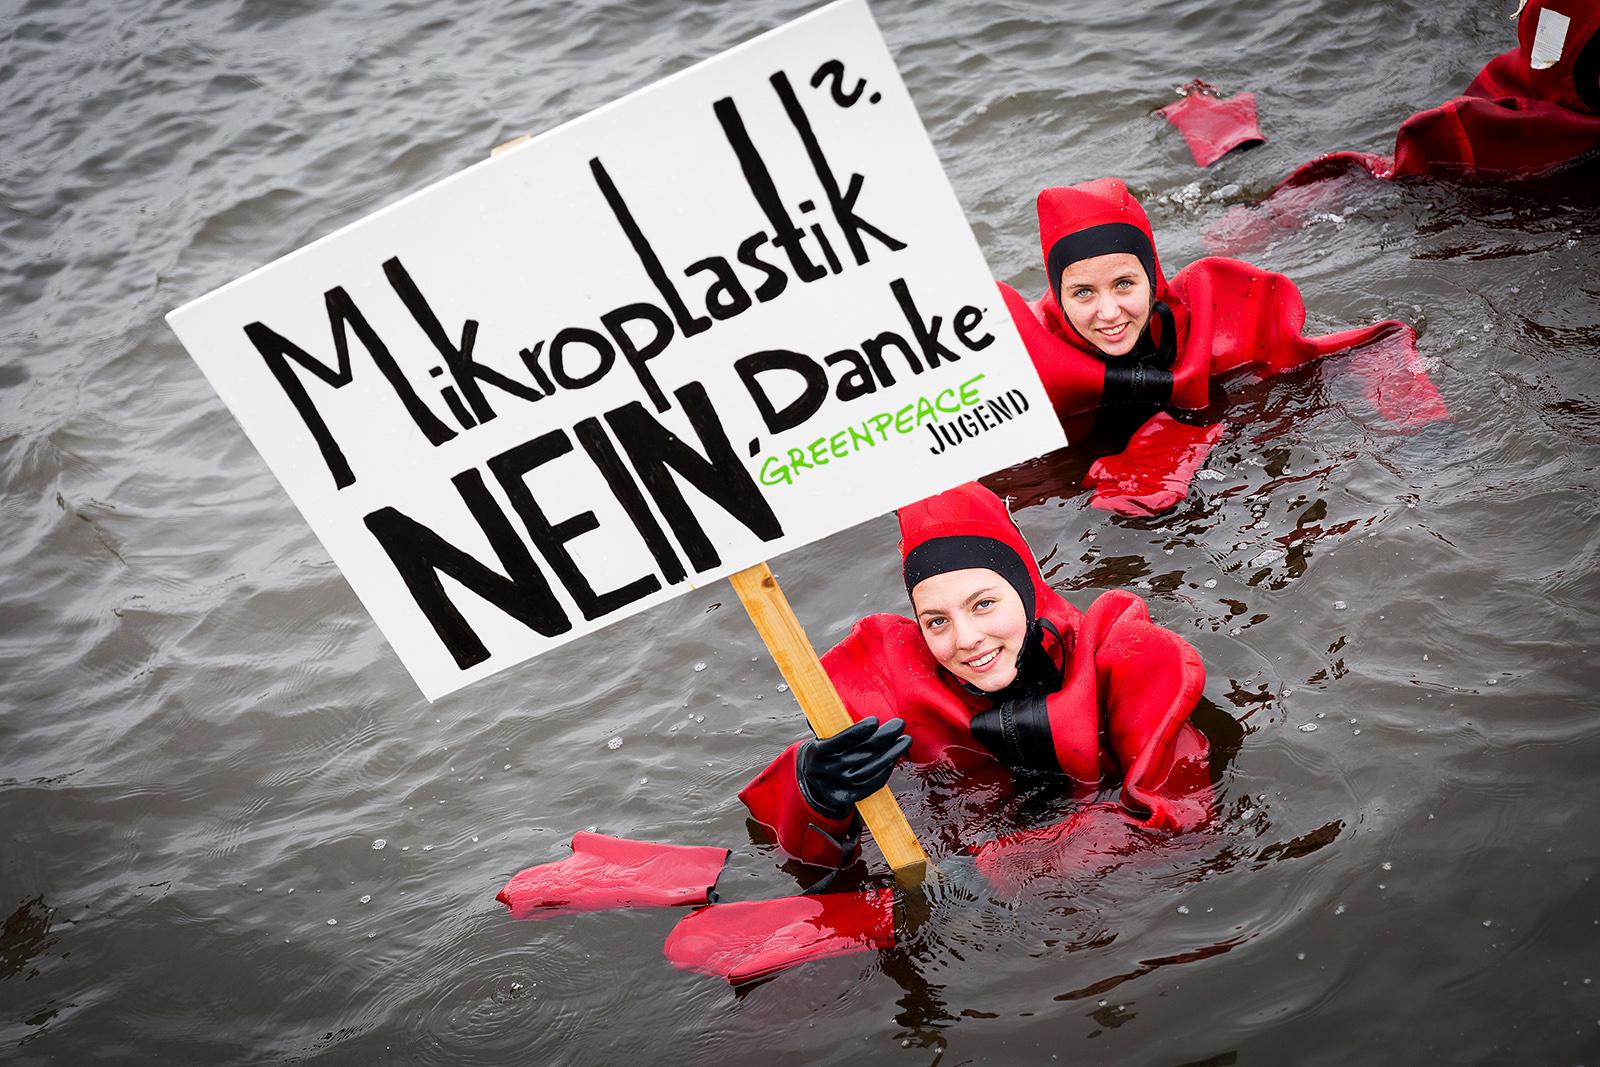 Greenpeace-Jugendliche protestieren in der Hamburger Alster gegen Mikroplastik in Kosmetikprodukten. 2016